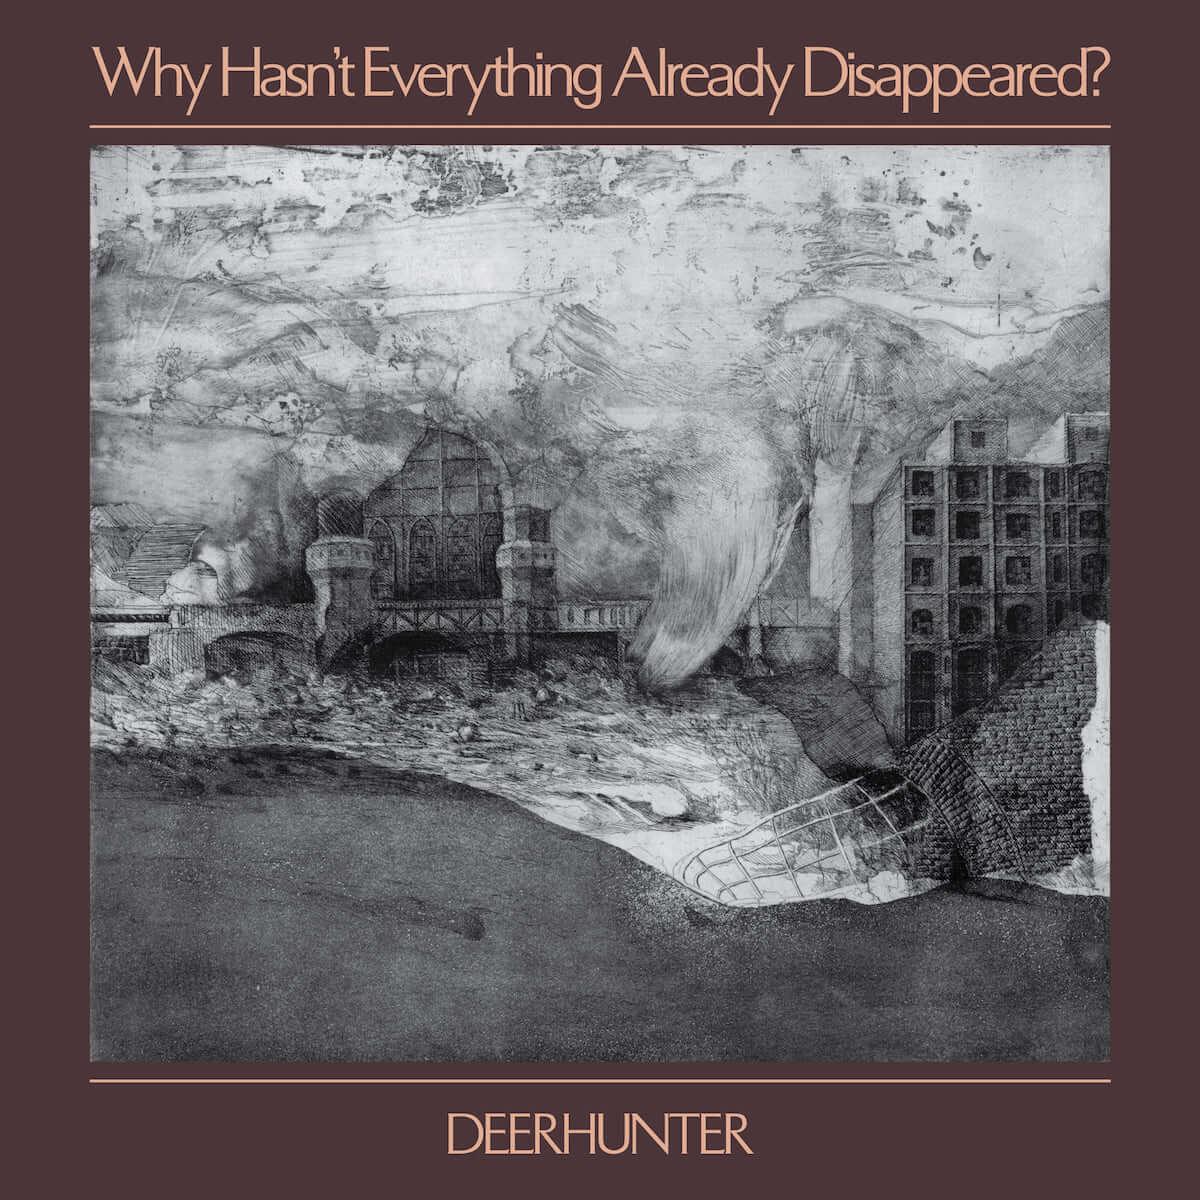 DEERHUNTERが新曲「Plains」公開。今月末に来日公演も music190110-deerhunter-01-1200x1200